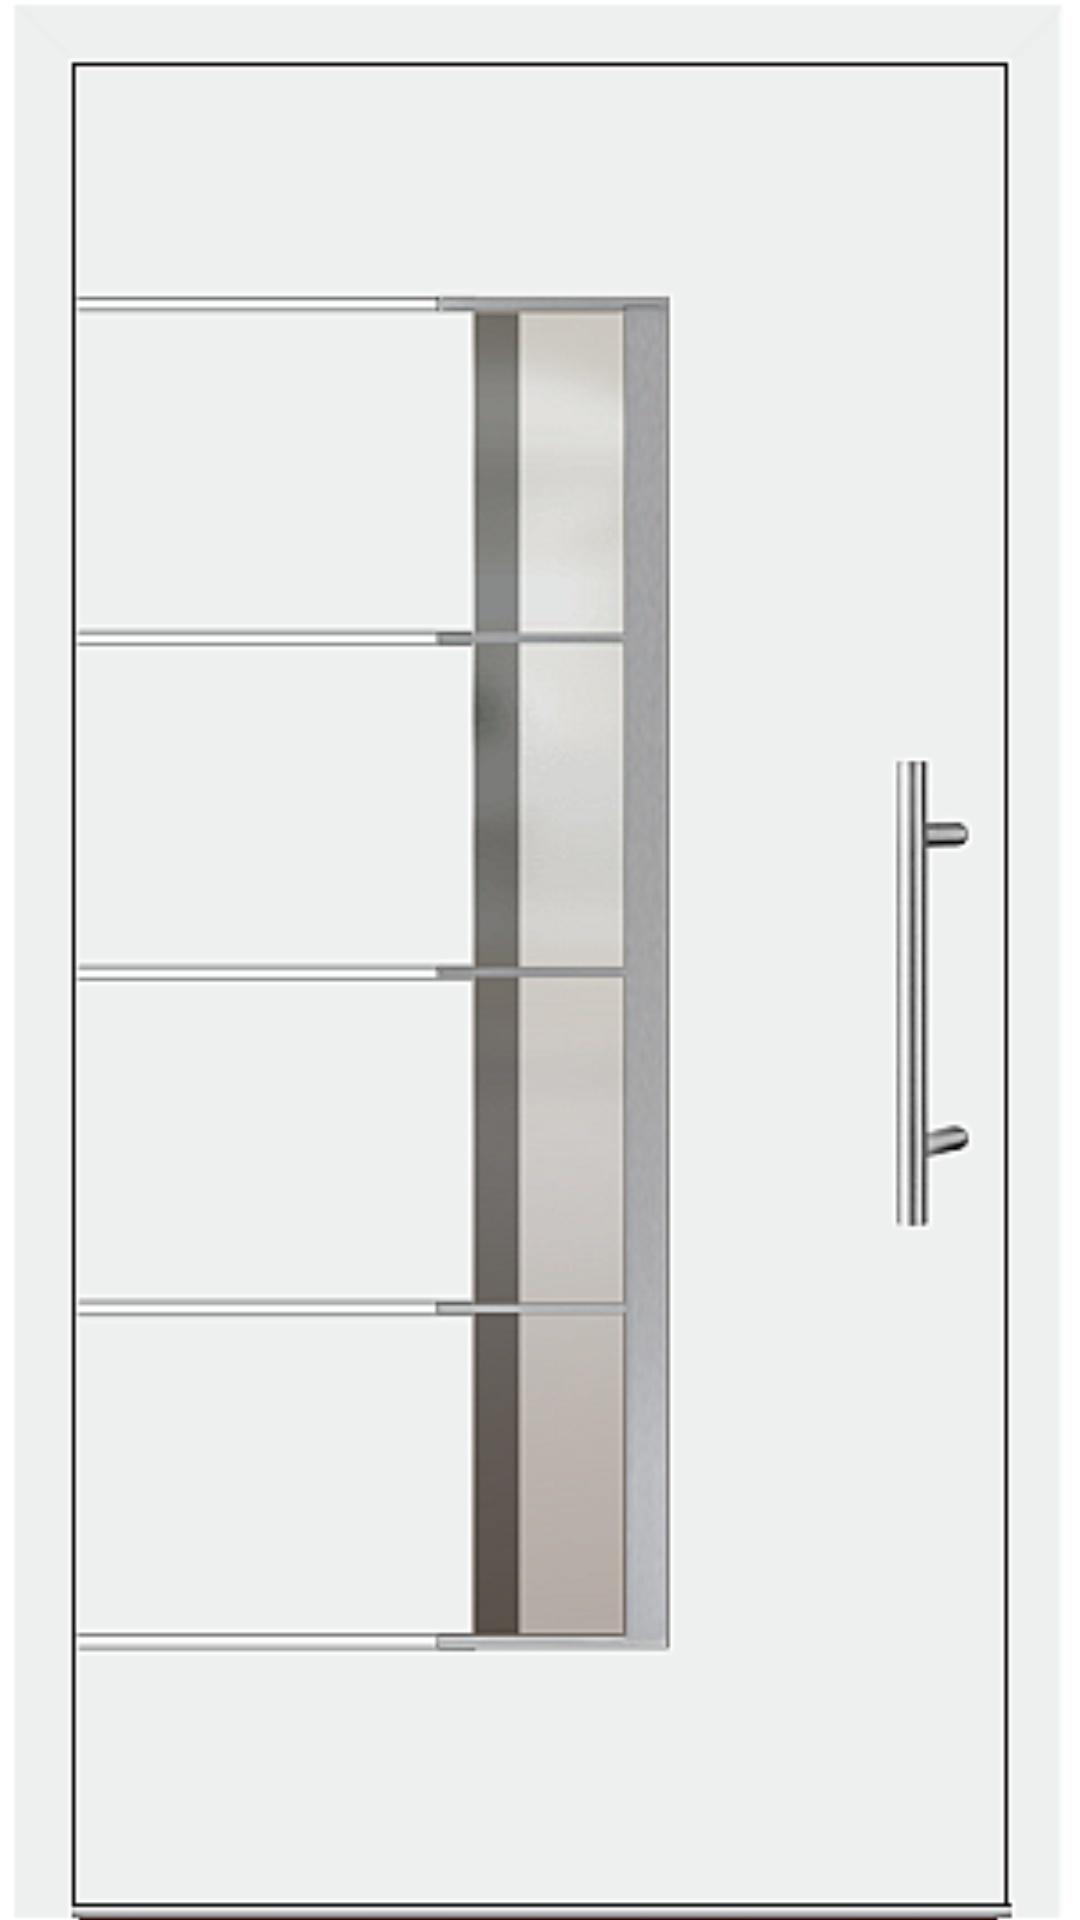 Aluminium Haustür Modell 6978-79 weiß